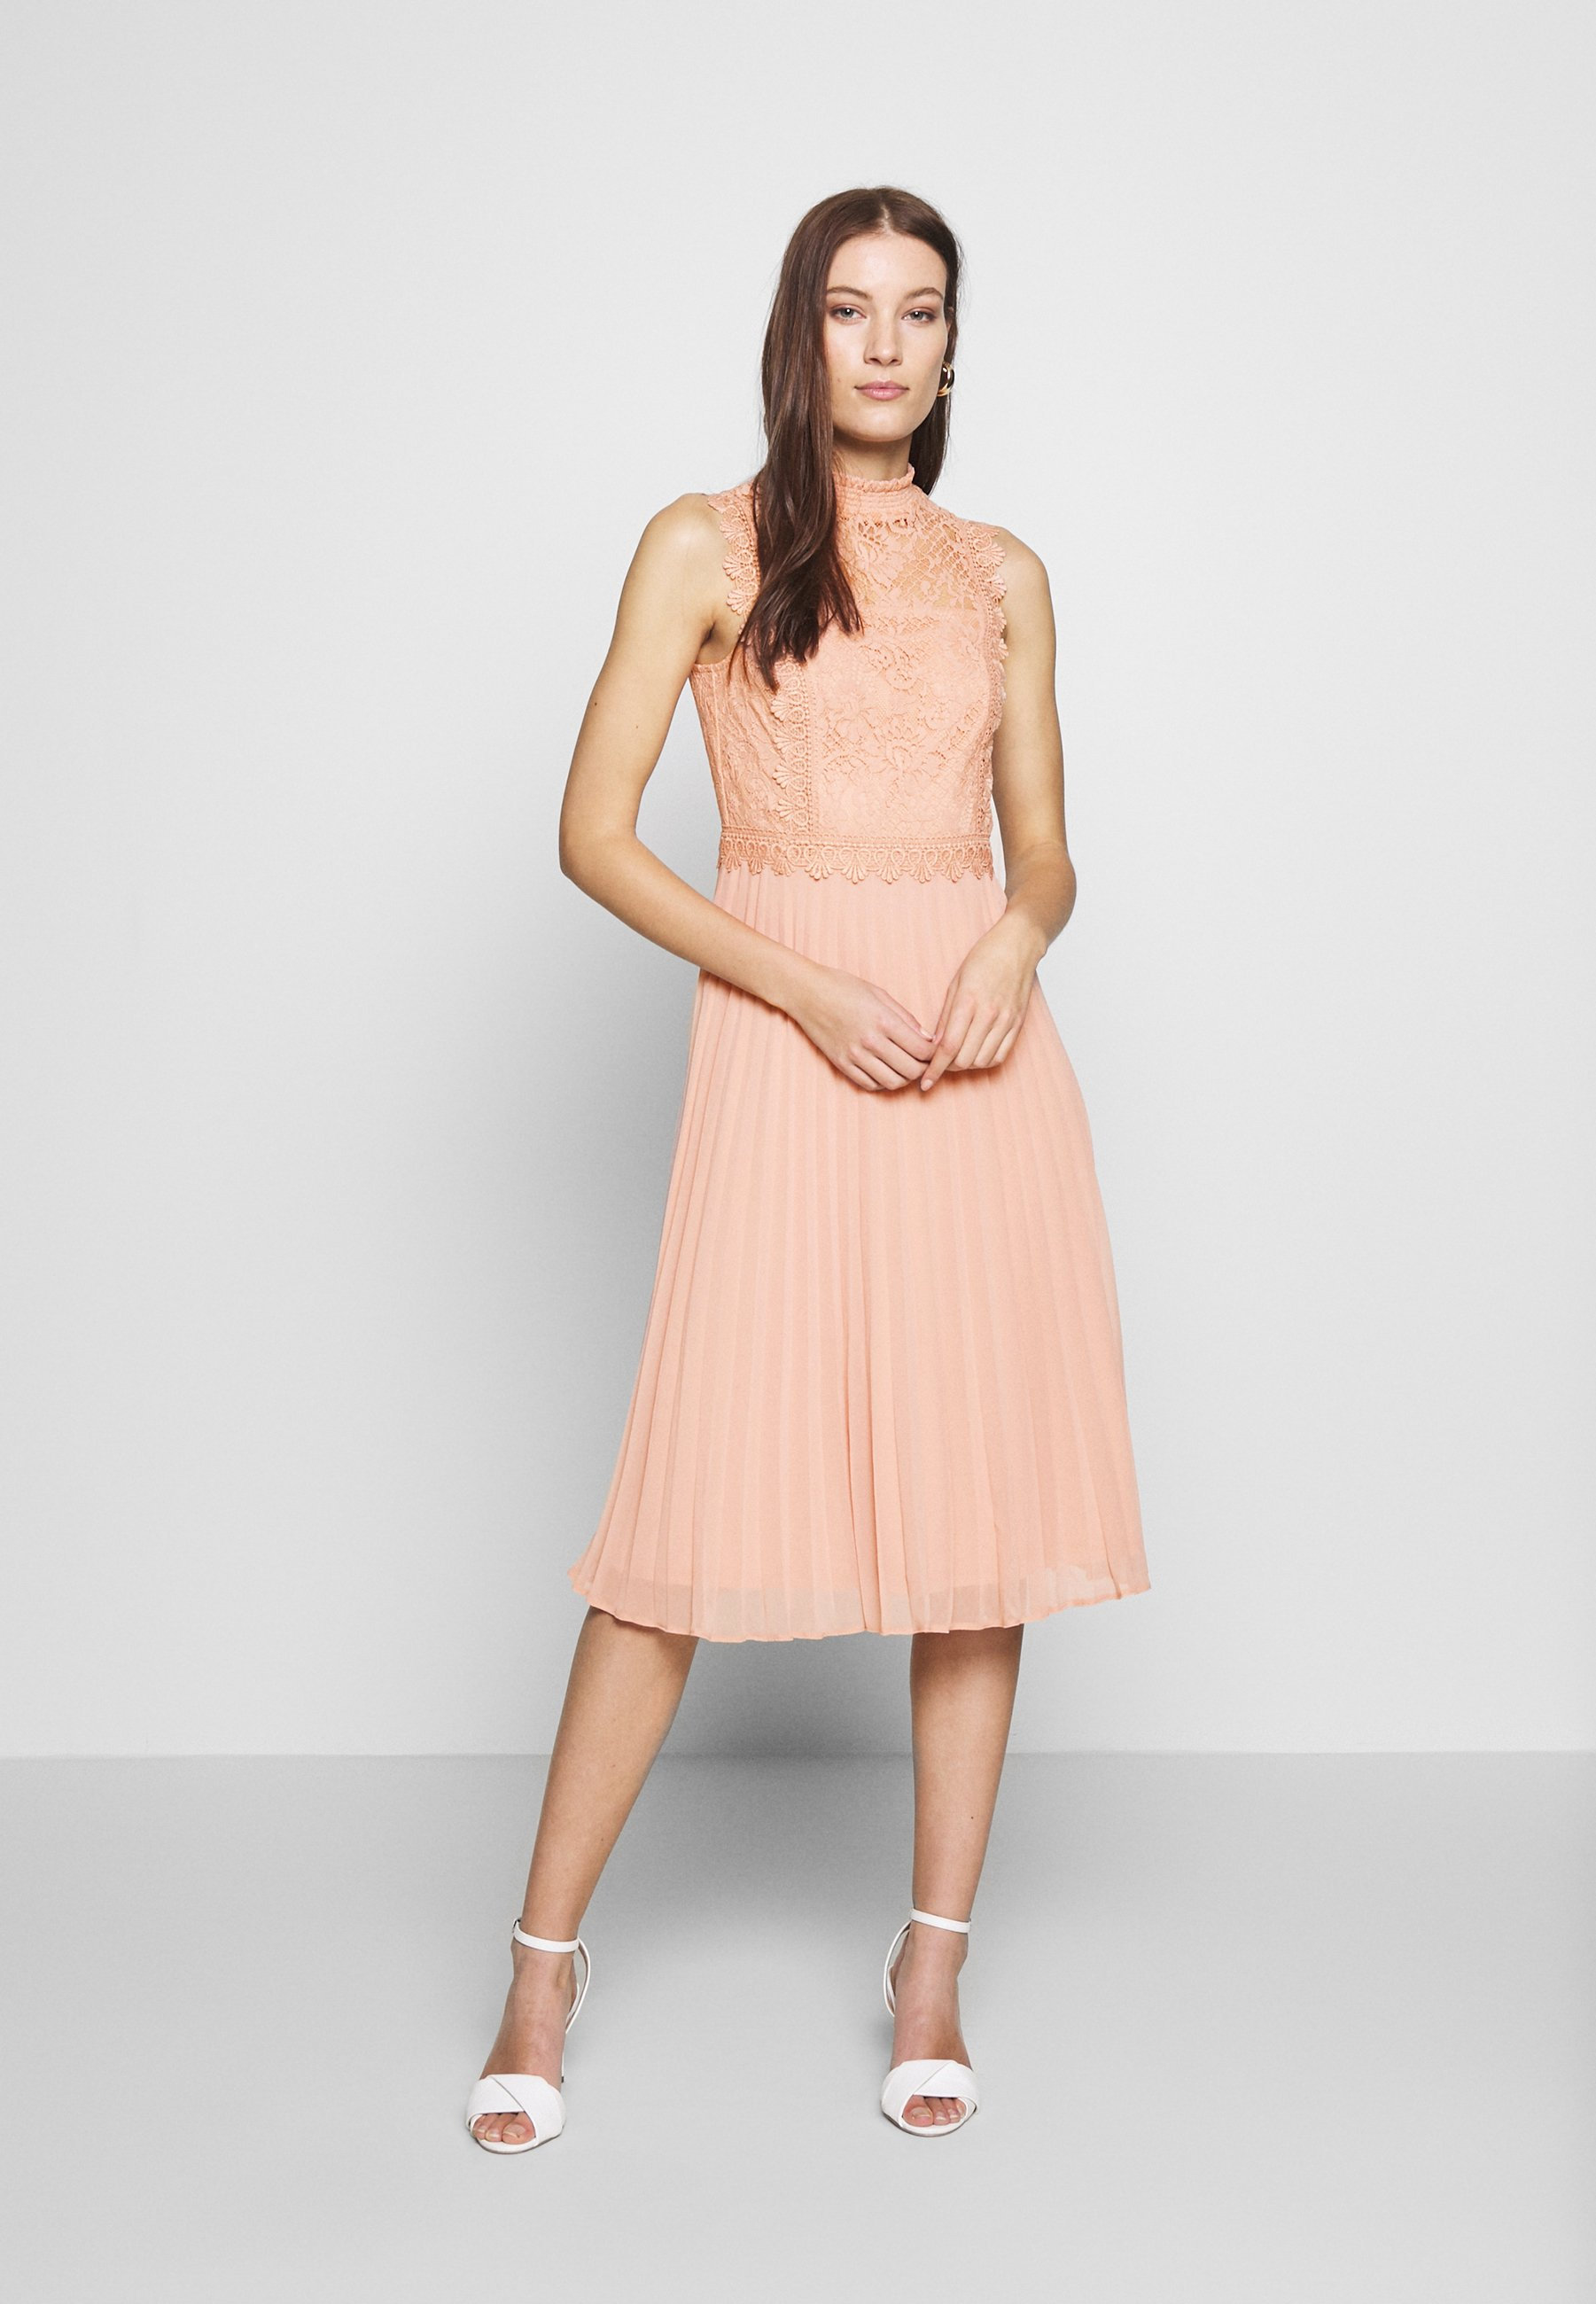 Dorothy Perkins Pleated Midi Dress Cocktailkleid Festliches Kleid Ecru Nude Zalando De